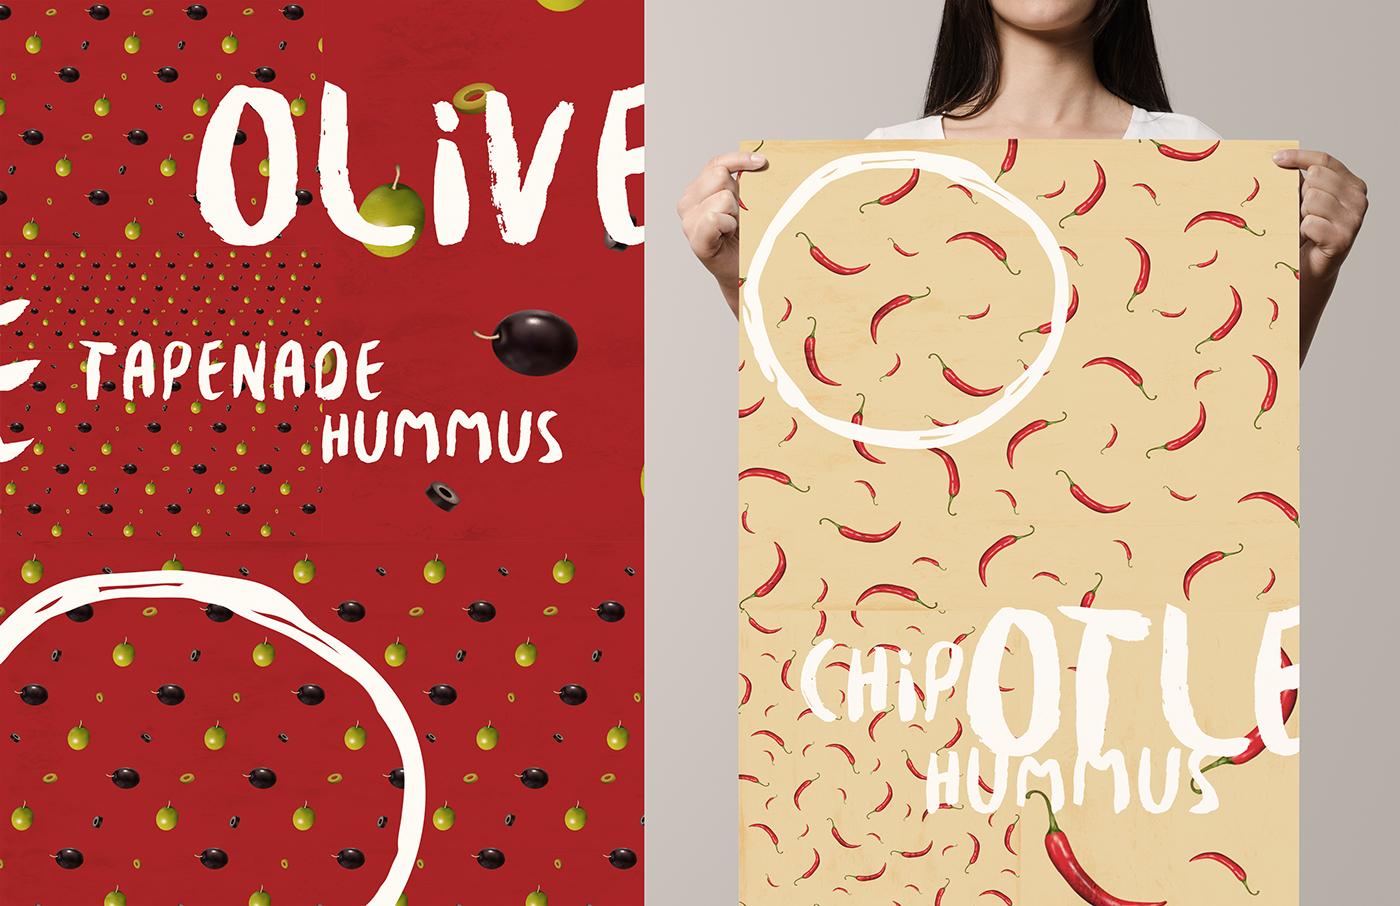 design Patterns branding  animation  Advertising  Food  tv spot sabra ILLUSTRATION  art direction